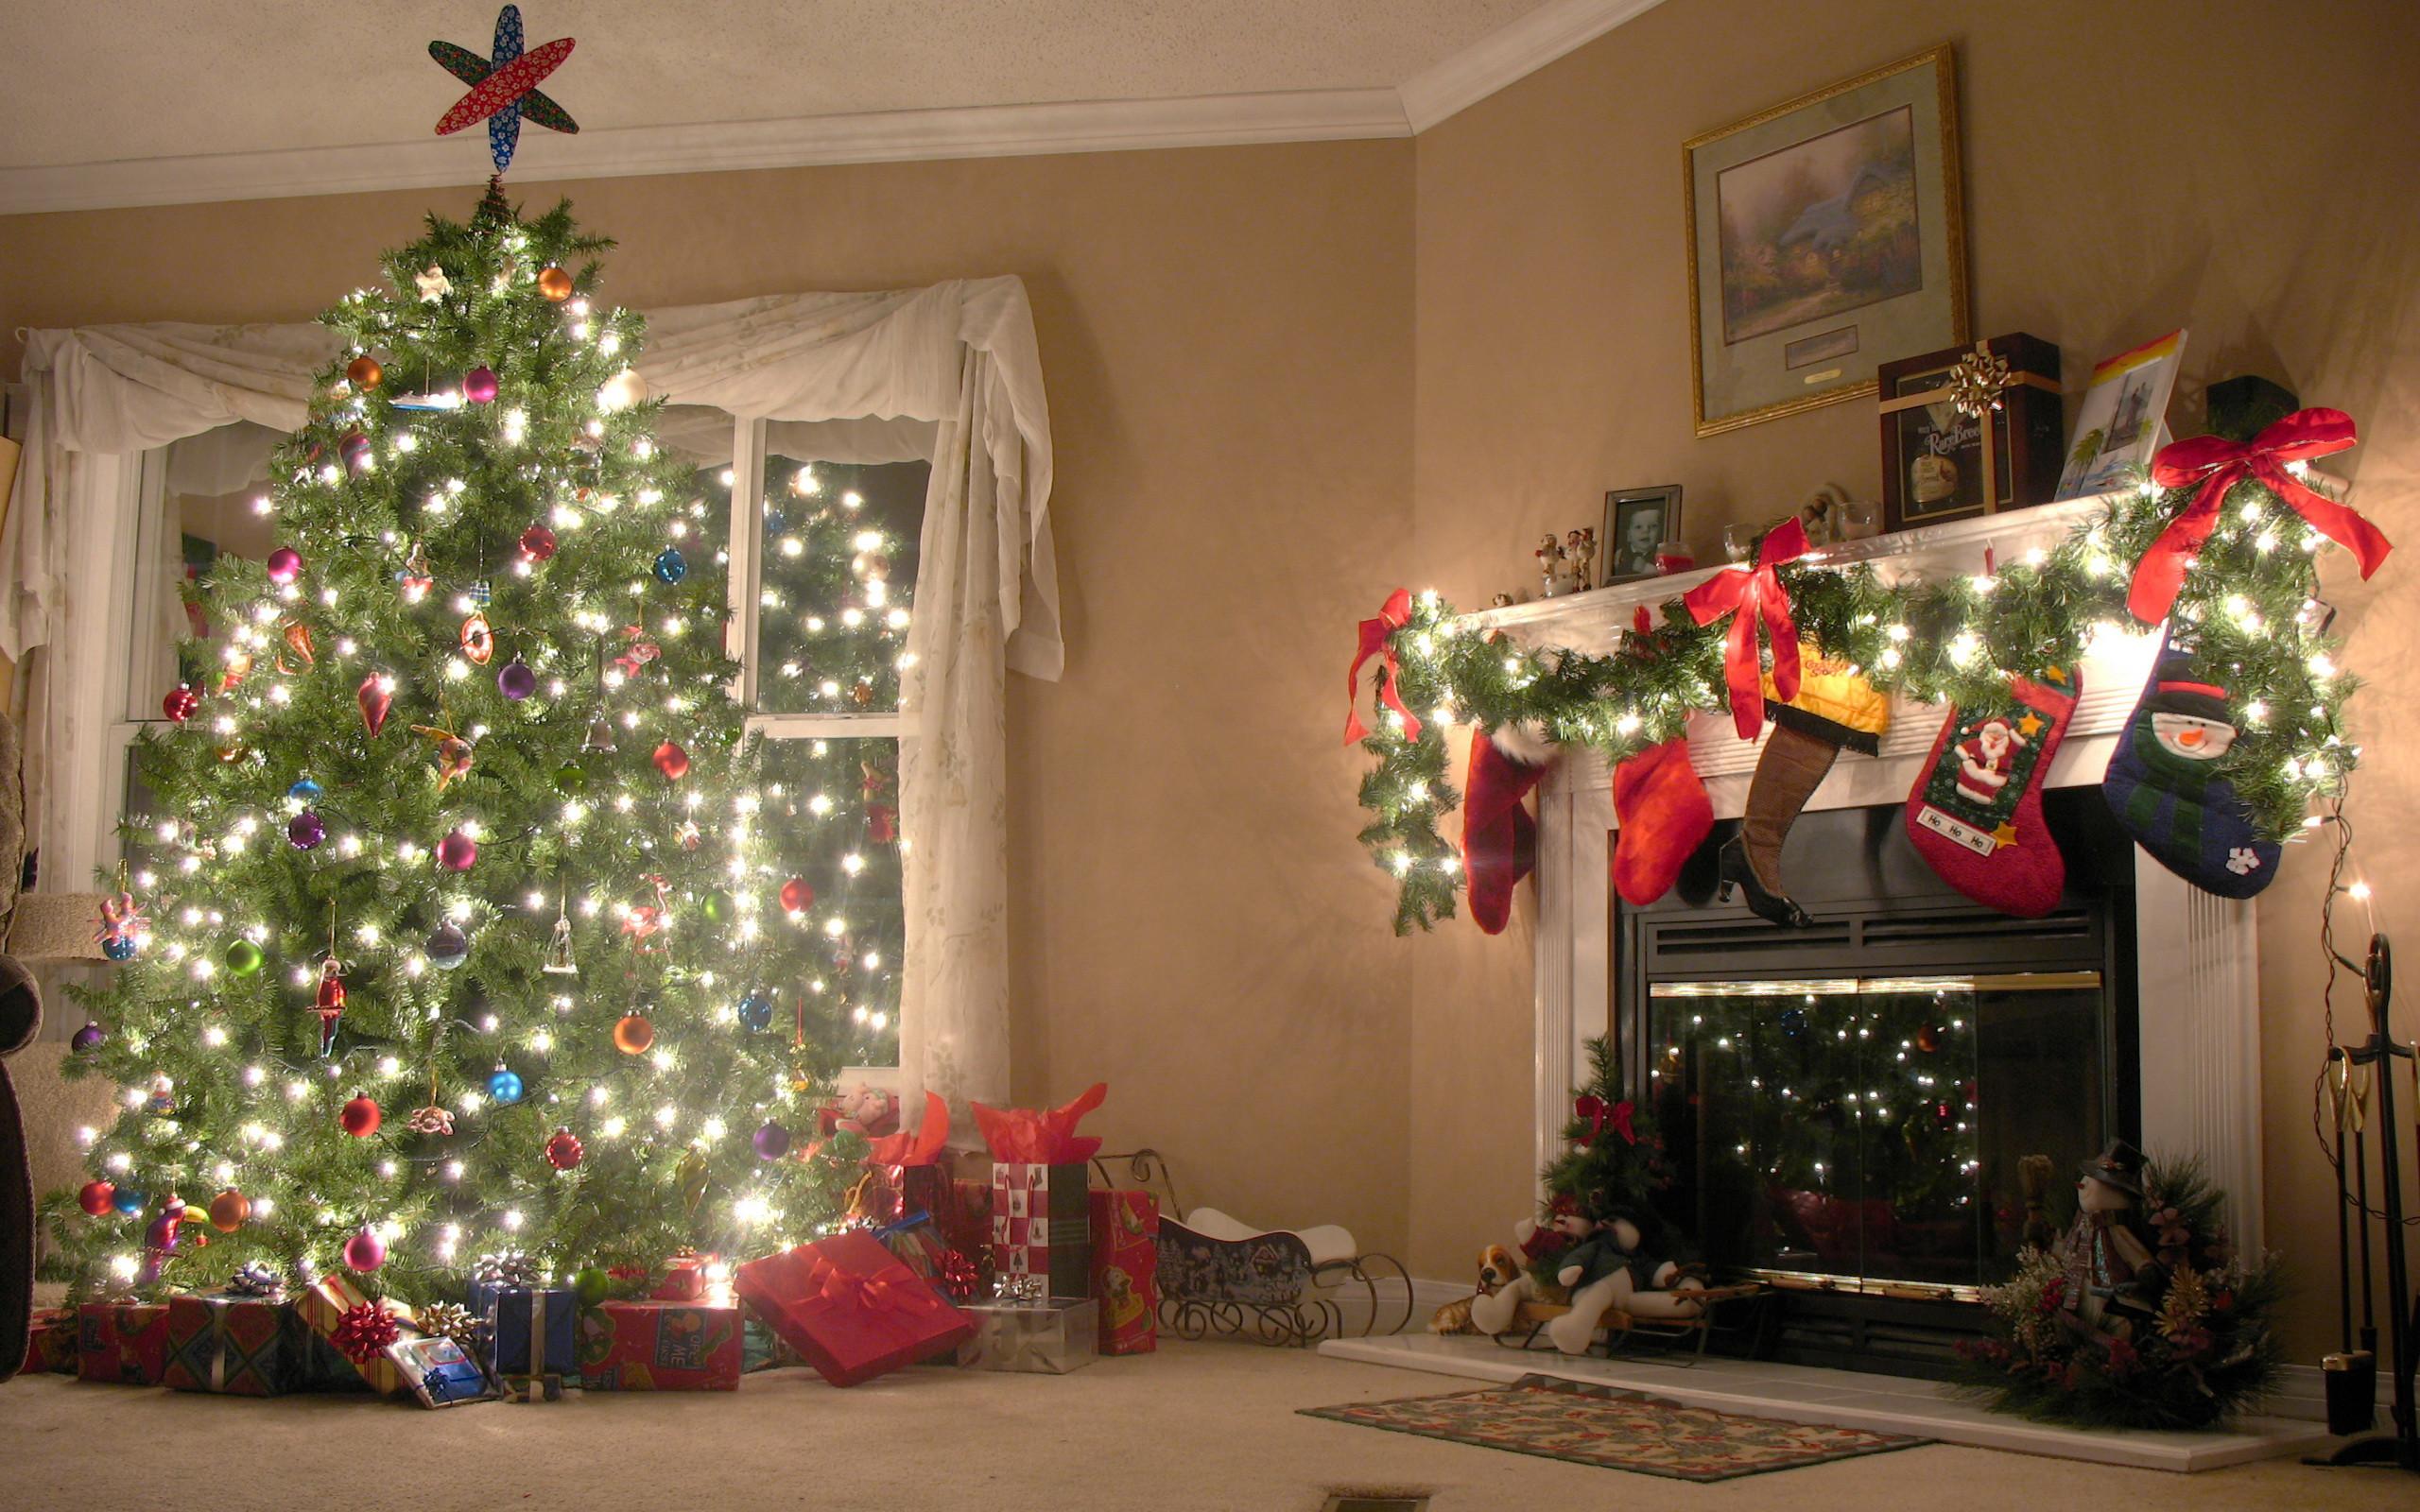 Christmas Tree Fireplace  12 Christmas Fireplace s Ideas